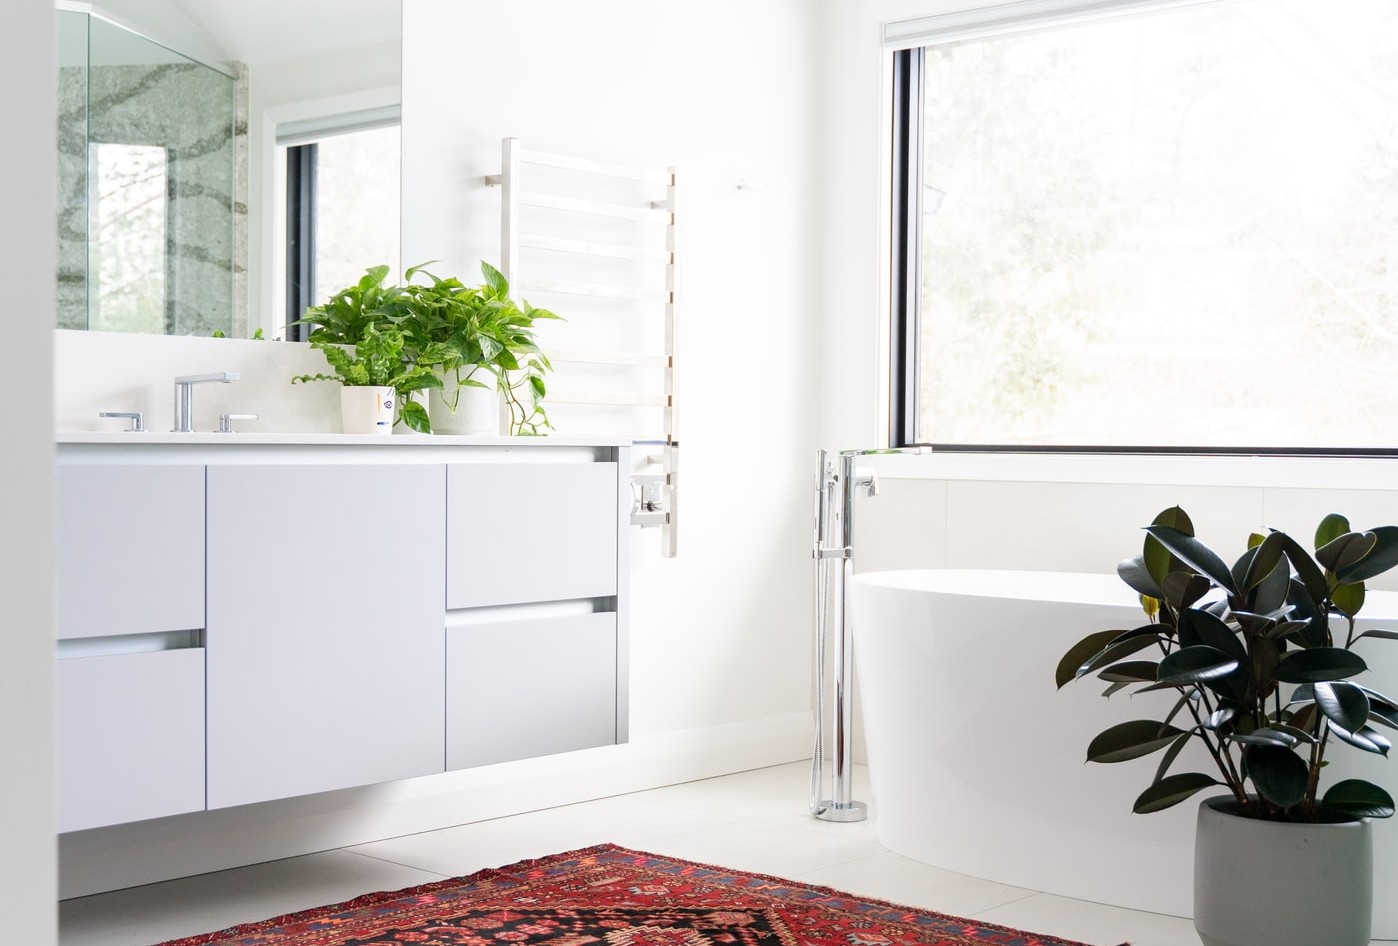 bathroom, plants